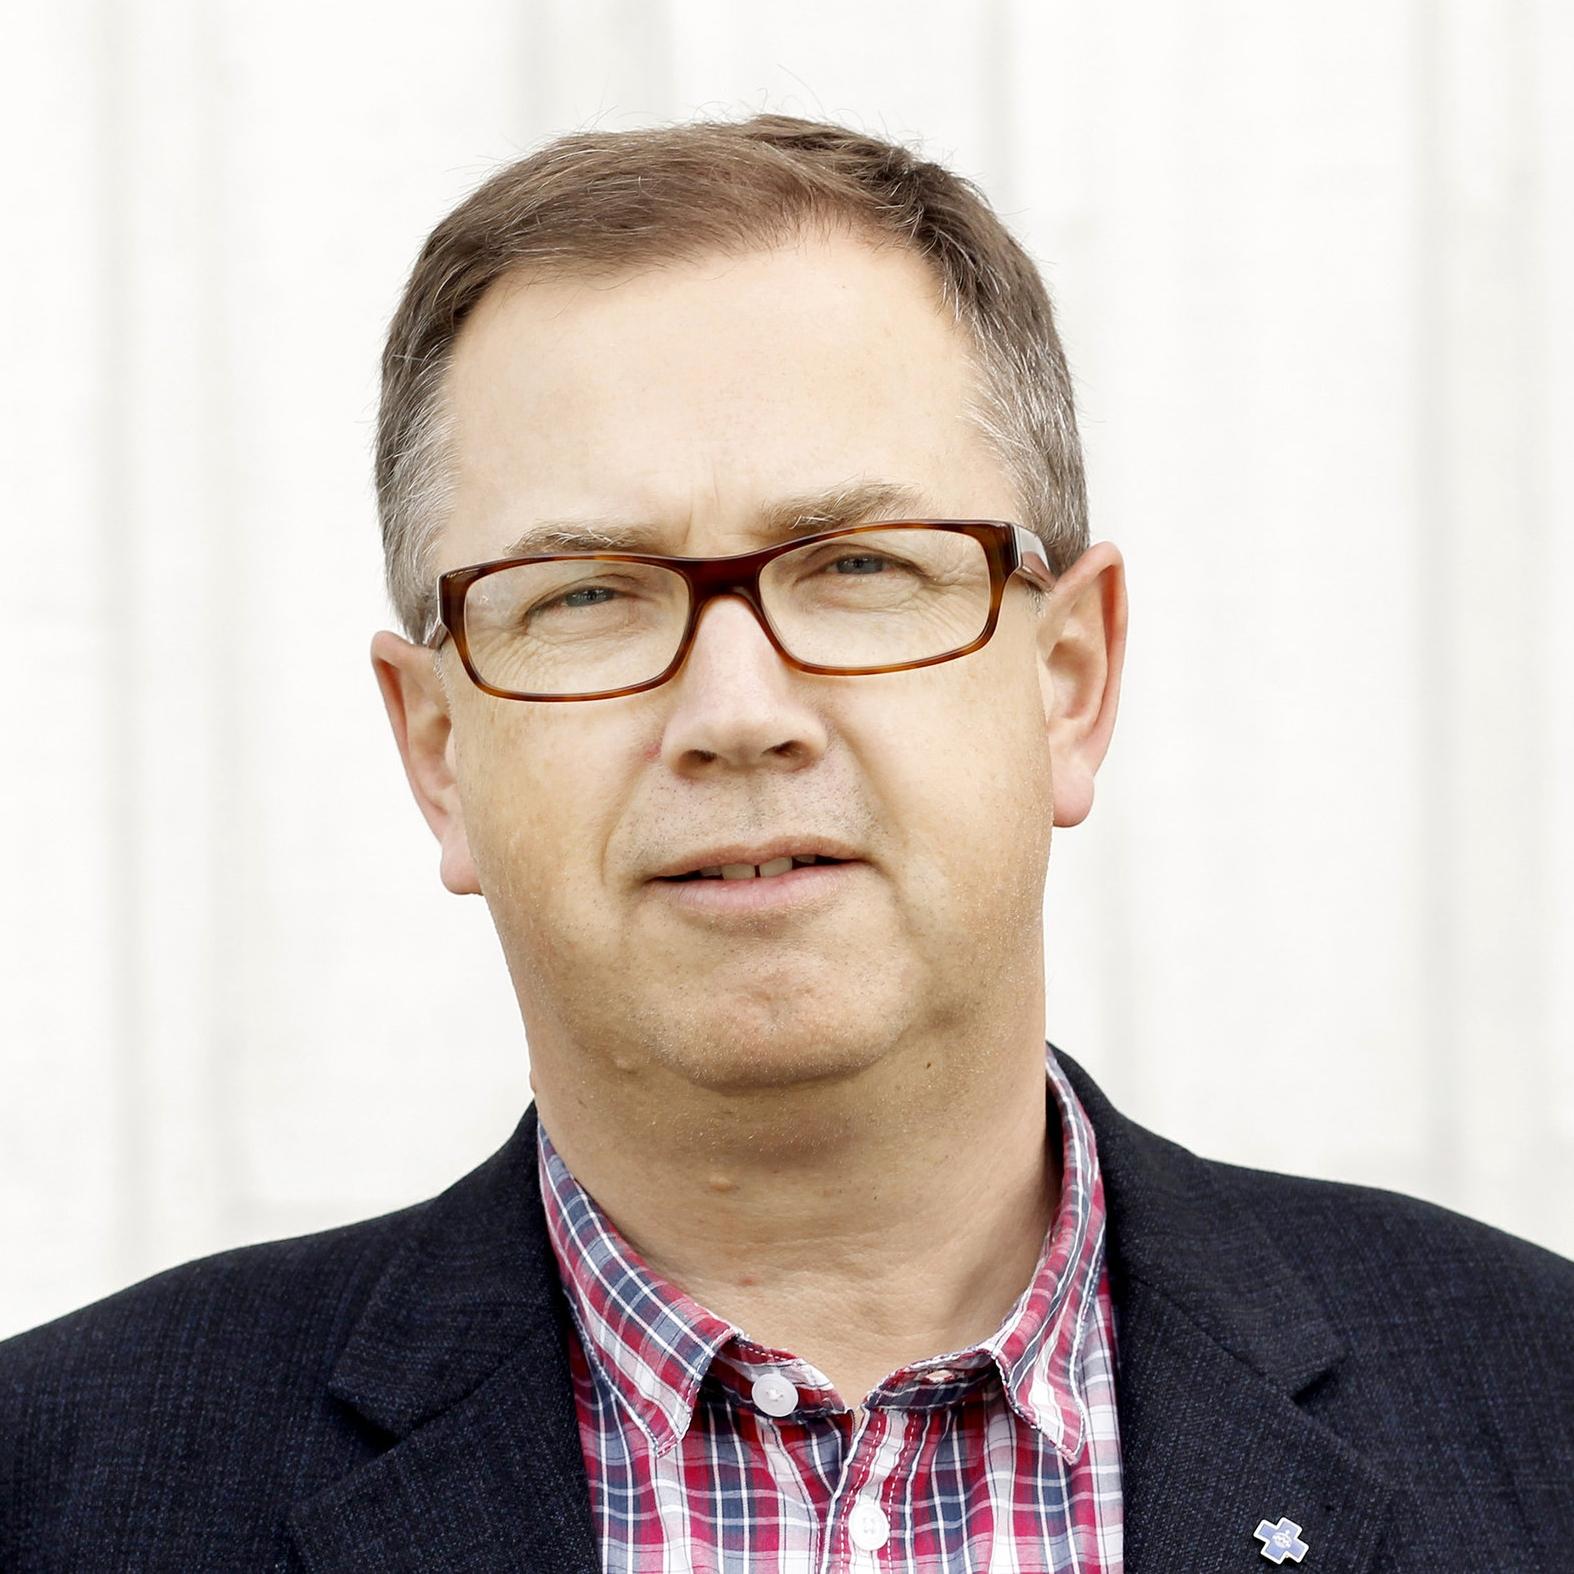 Henrik Pederby